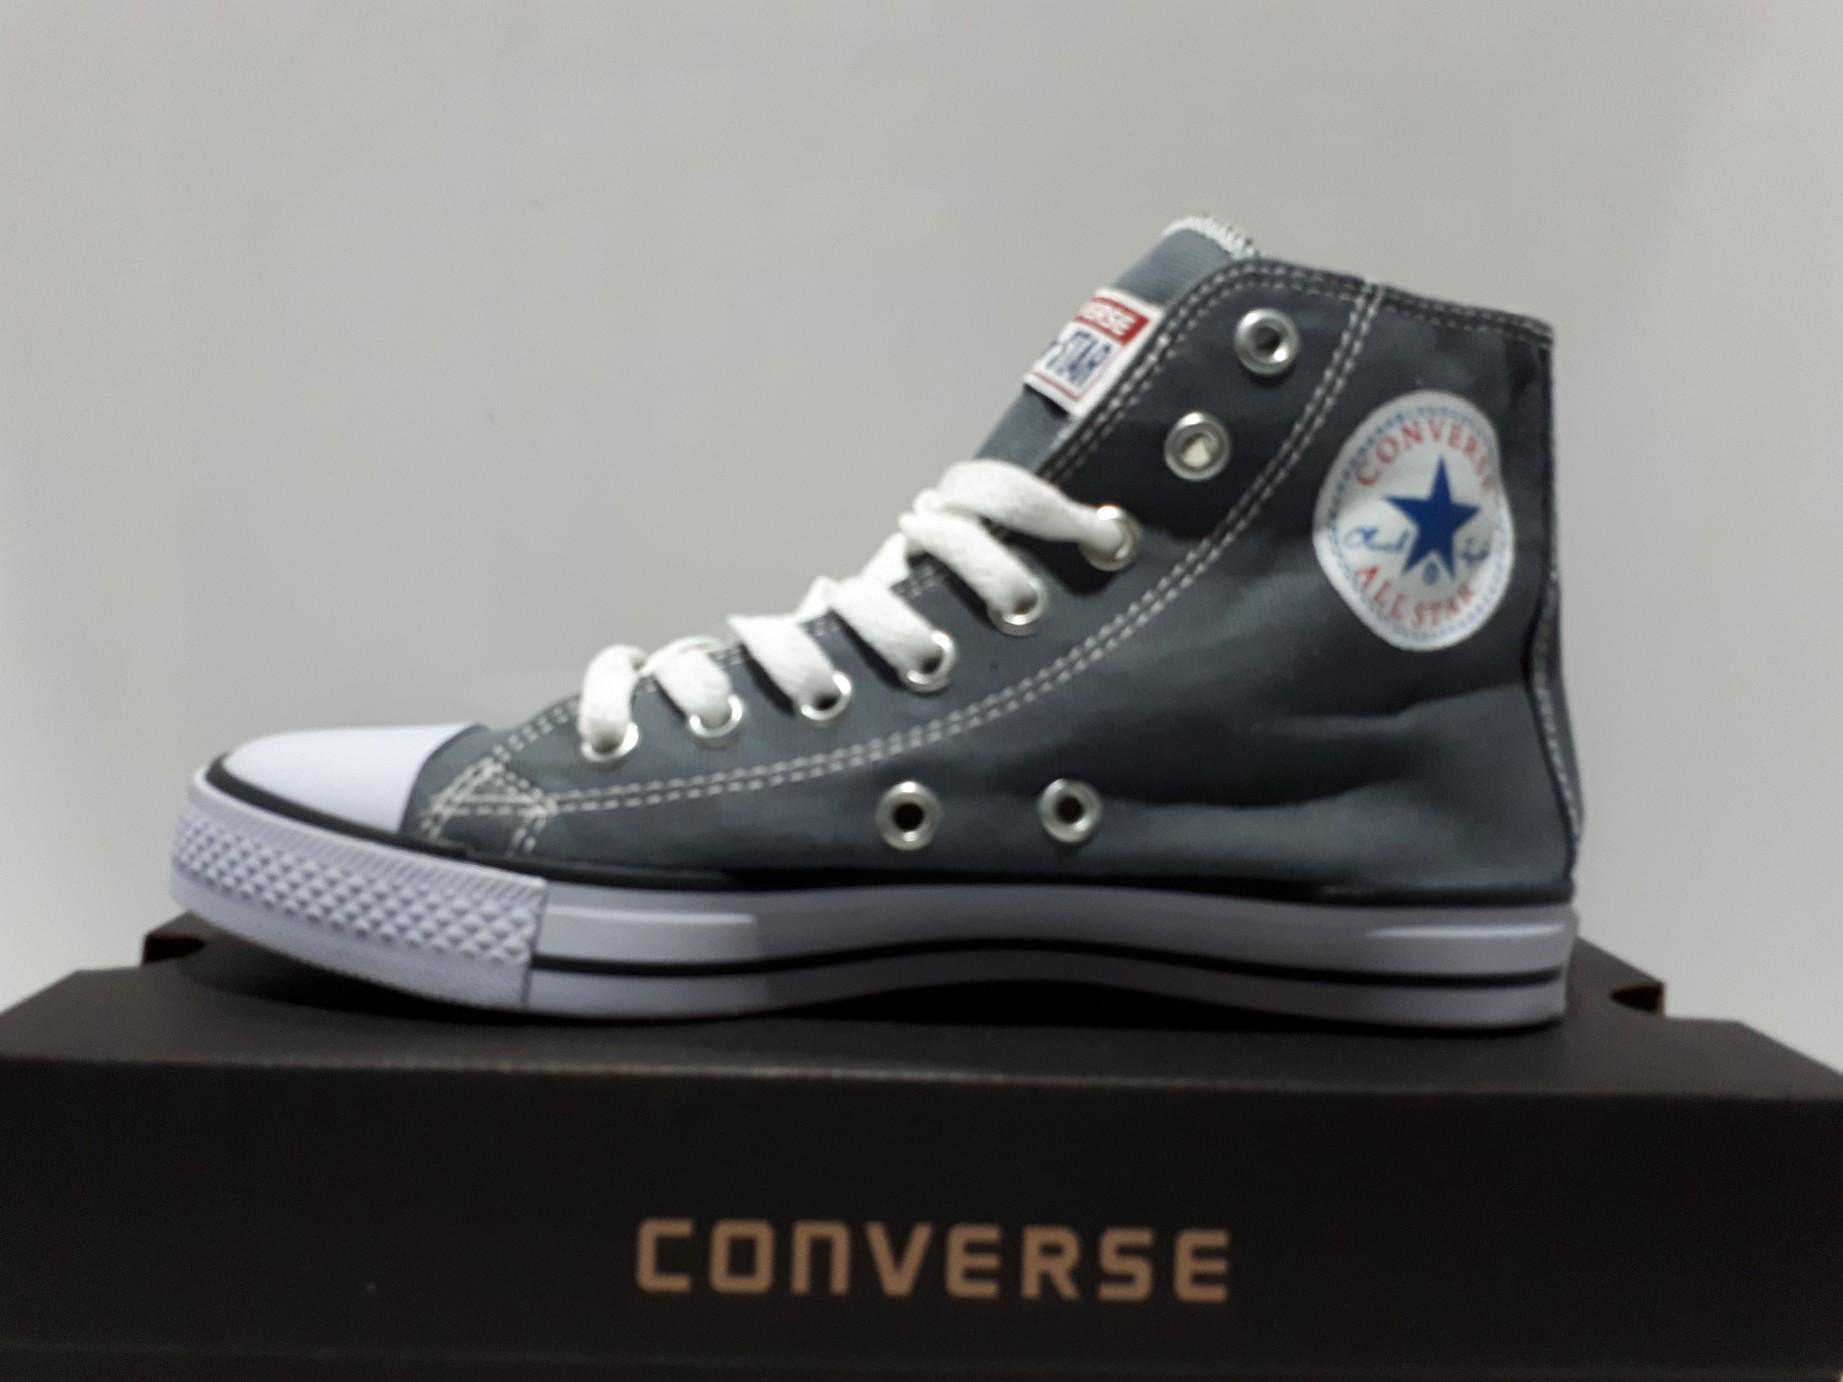 Sepatu kanvas allstars unisex sepatu pria dan wanita